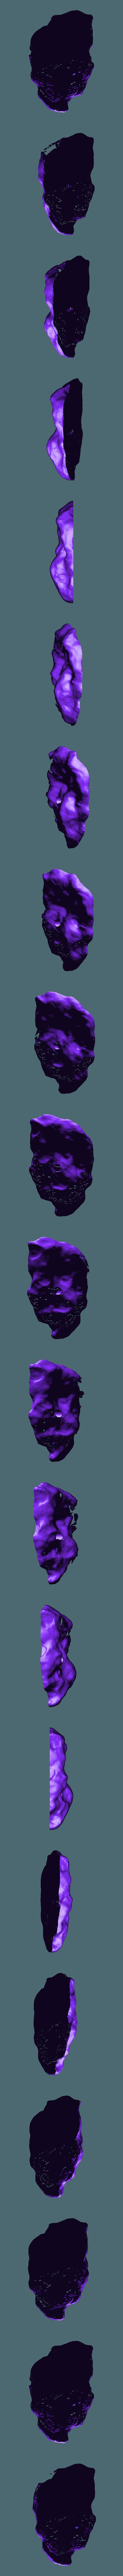 worm2.stl Download free STL file The Space Set • 3D print design, HeribertoValle